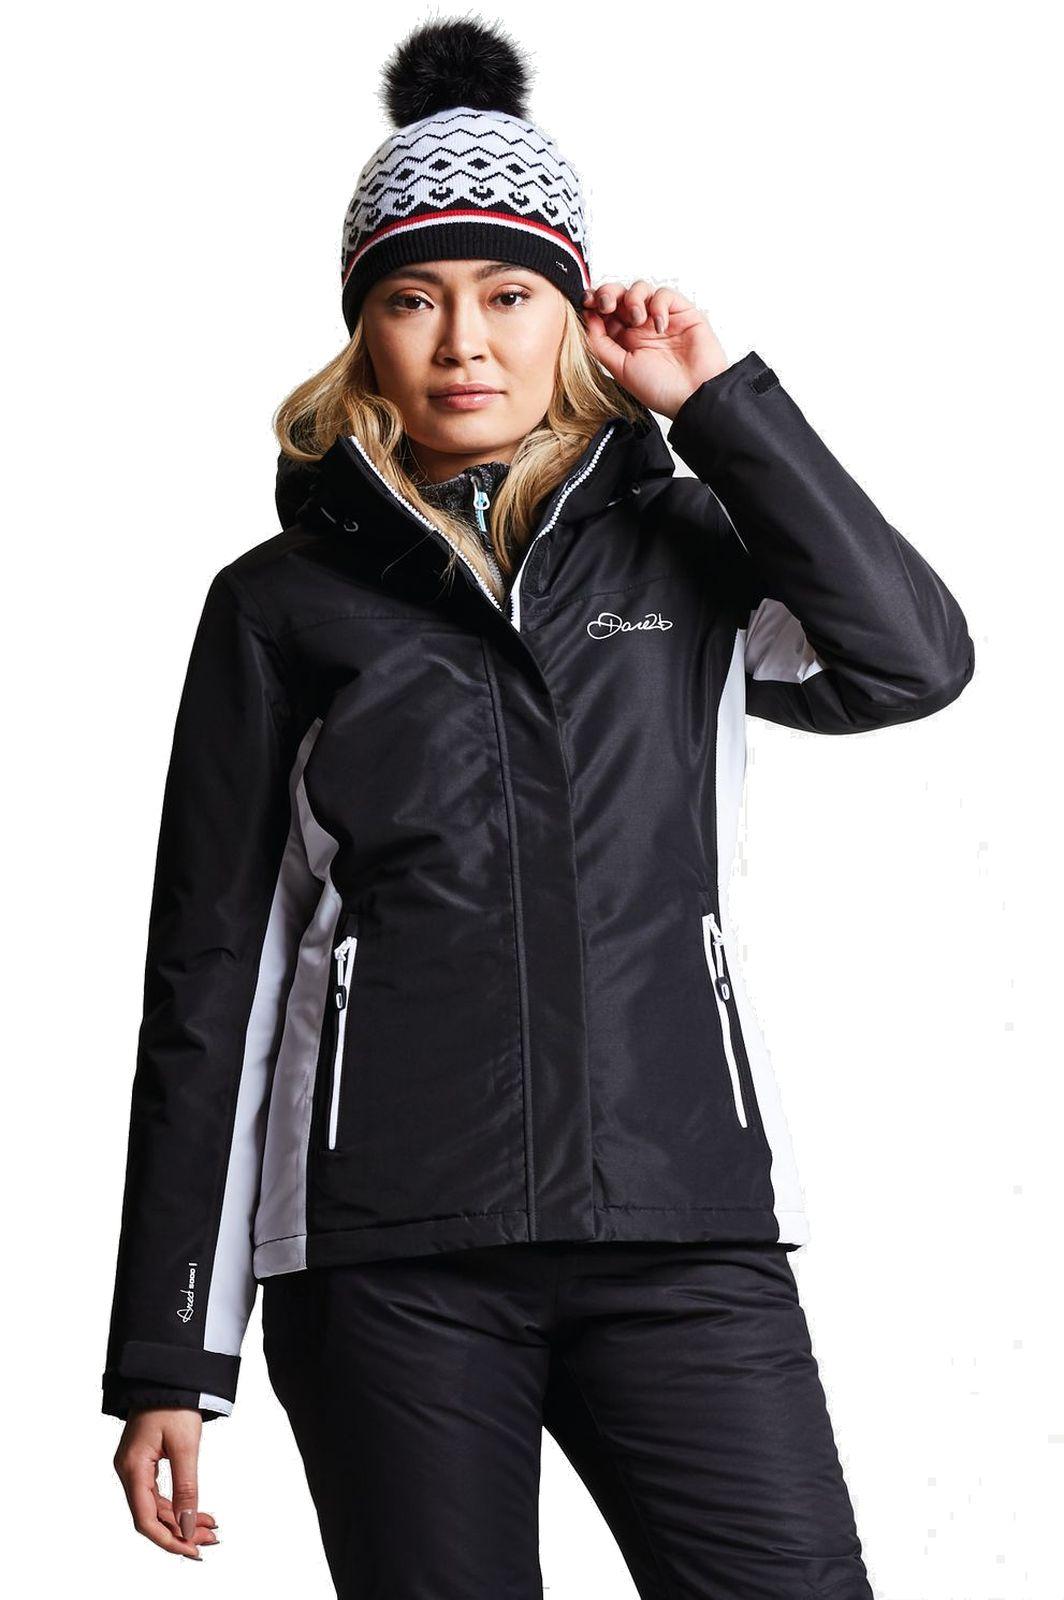 dare2b damen ski jacke skijacke prosperity jacket schwarz. Black Bedroom Furniture Sets. Home Design Ideas